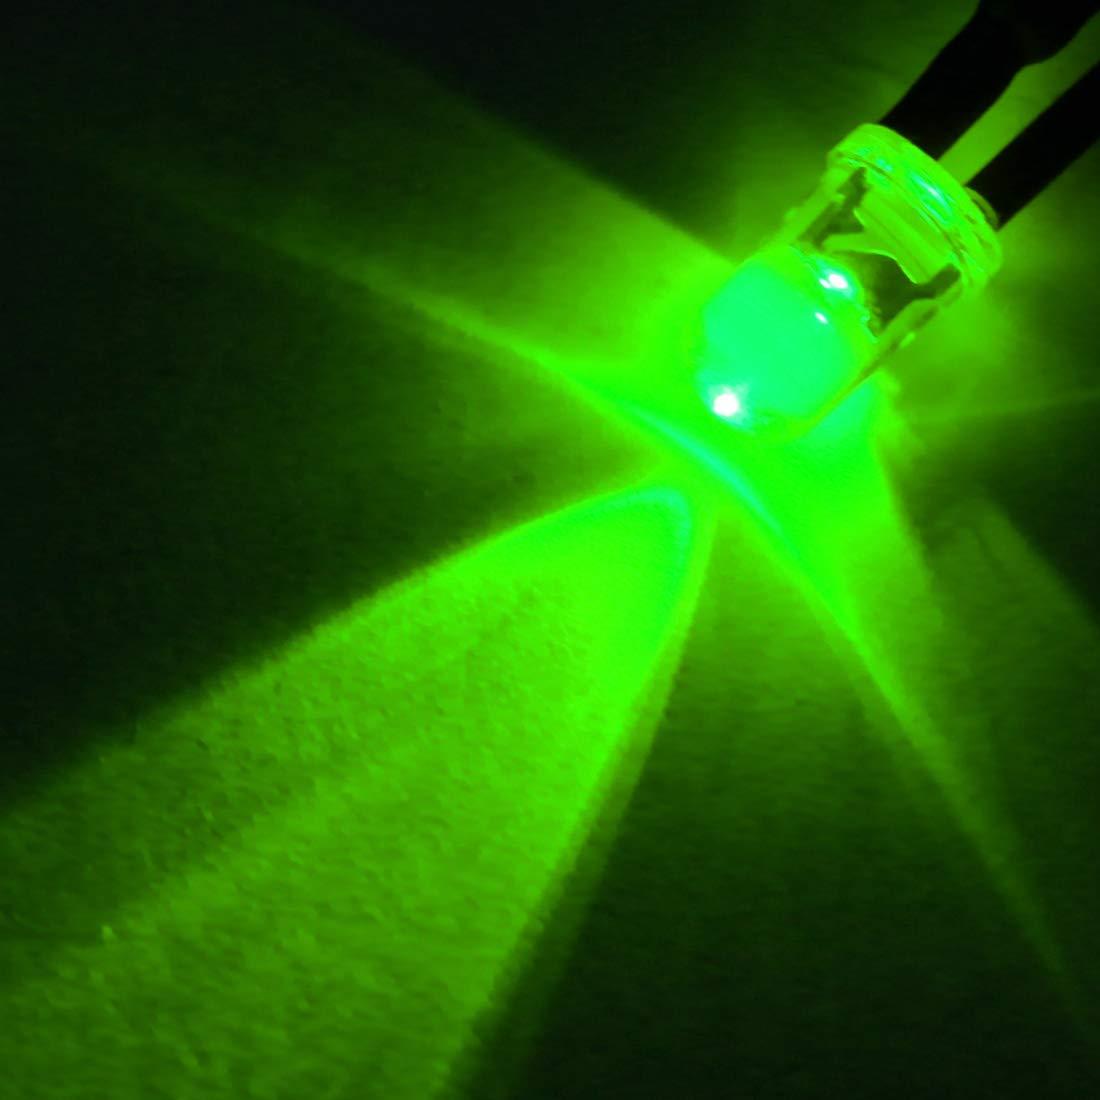 Light Emitting Diodes sourcing map 3Pcs 3mm Pre Wired LED Blue DC3-5V Clear Lens